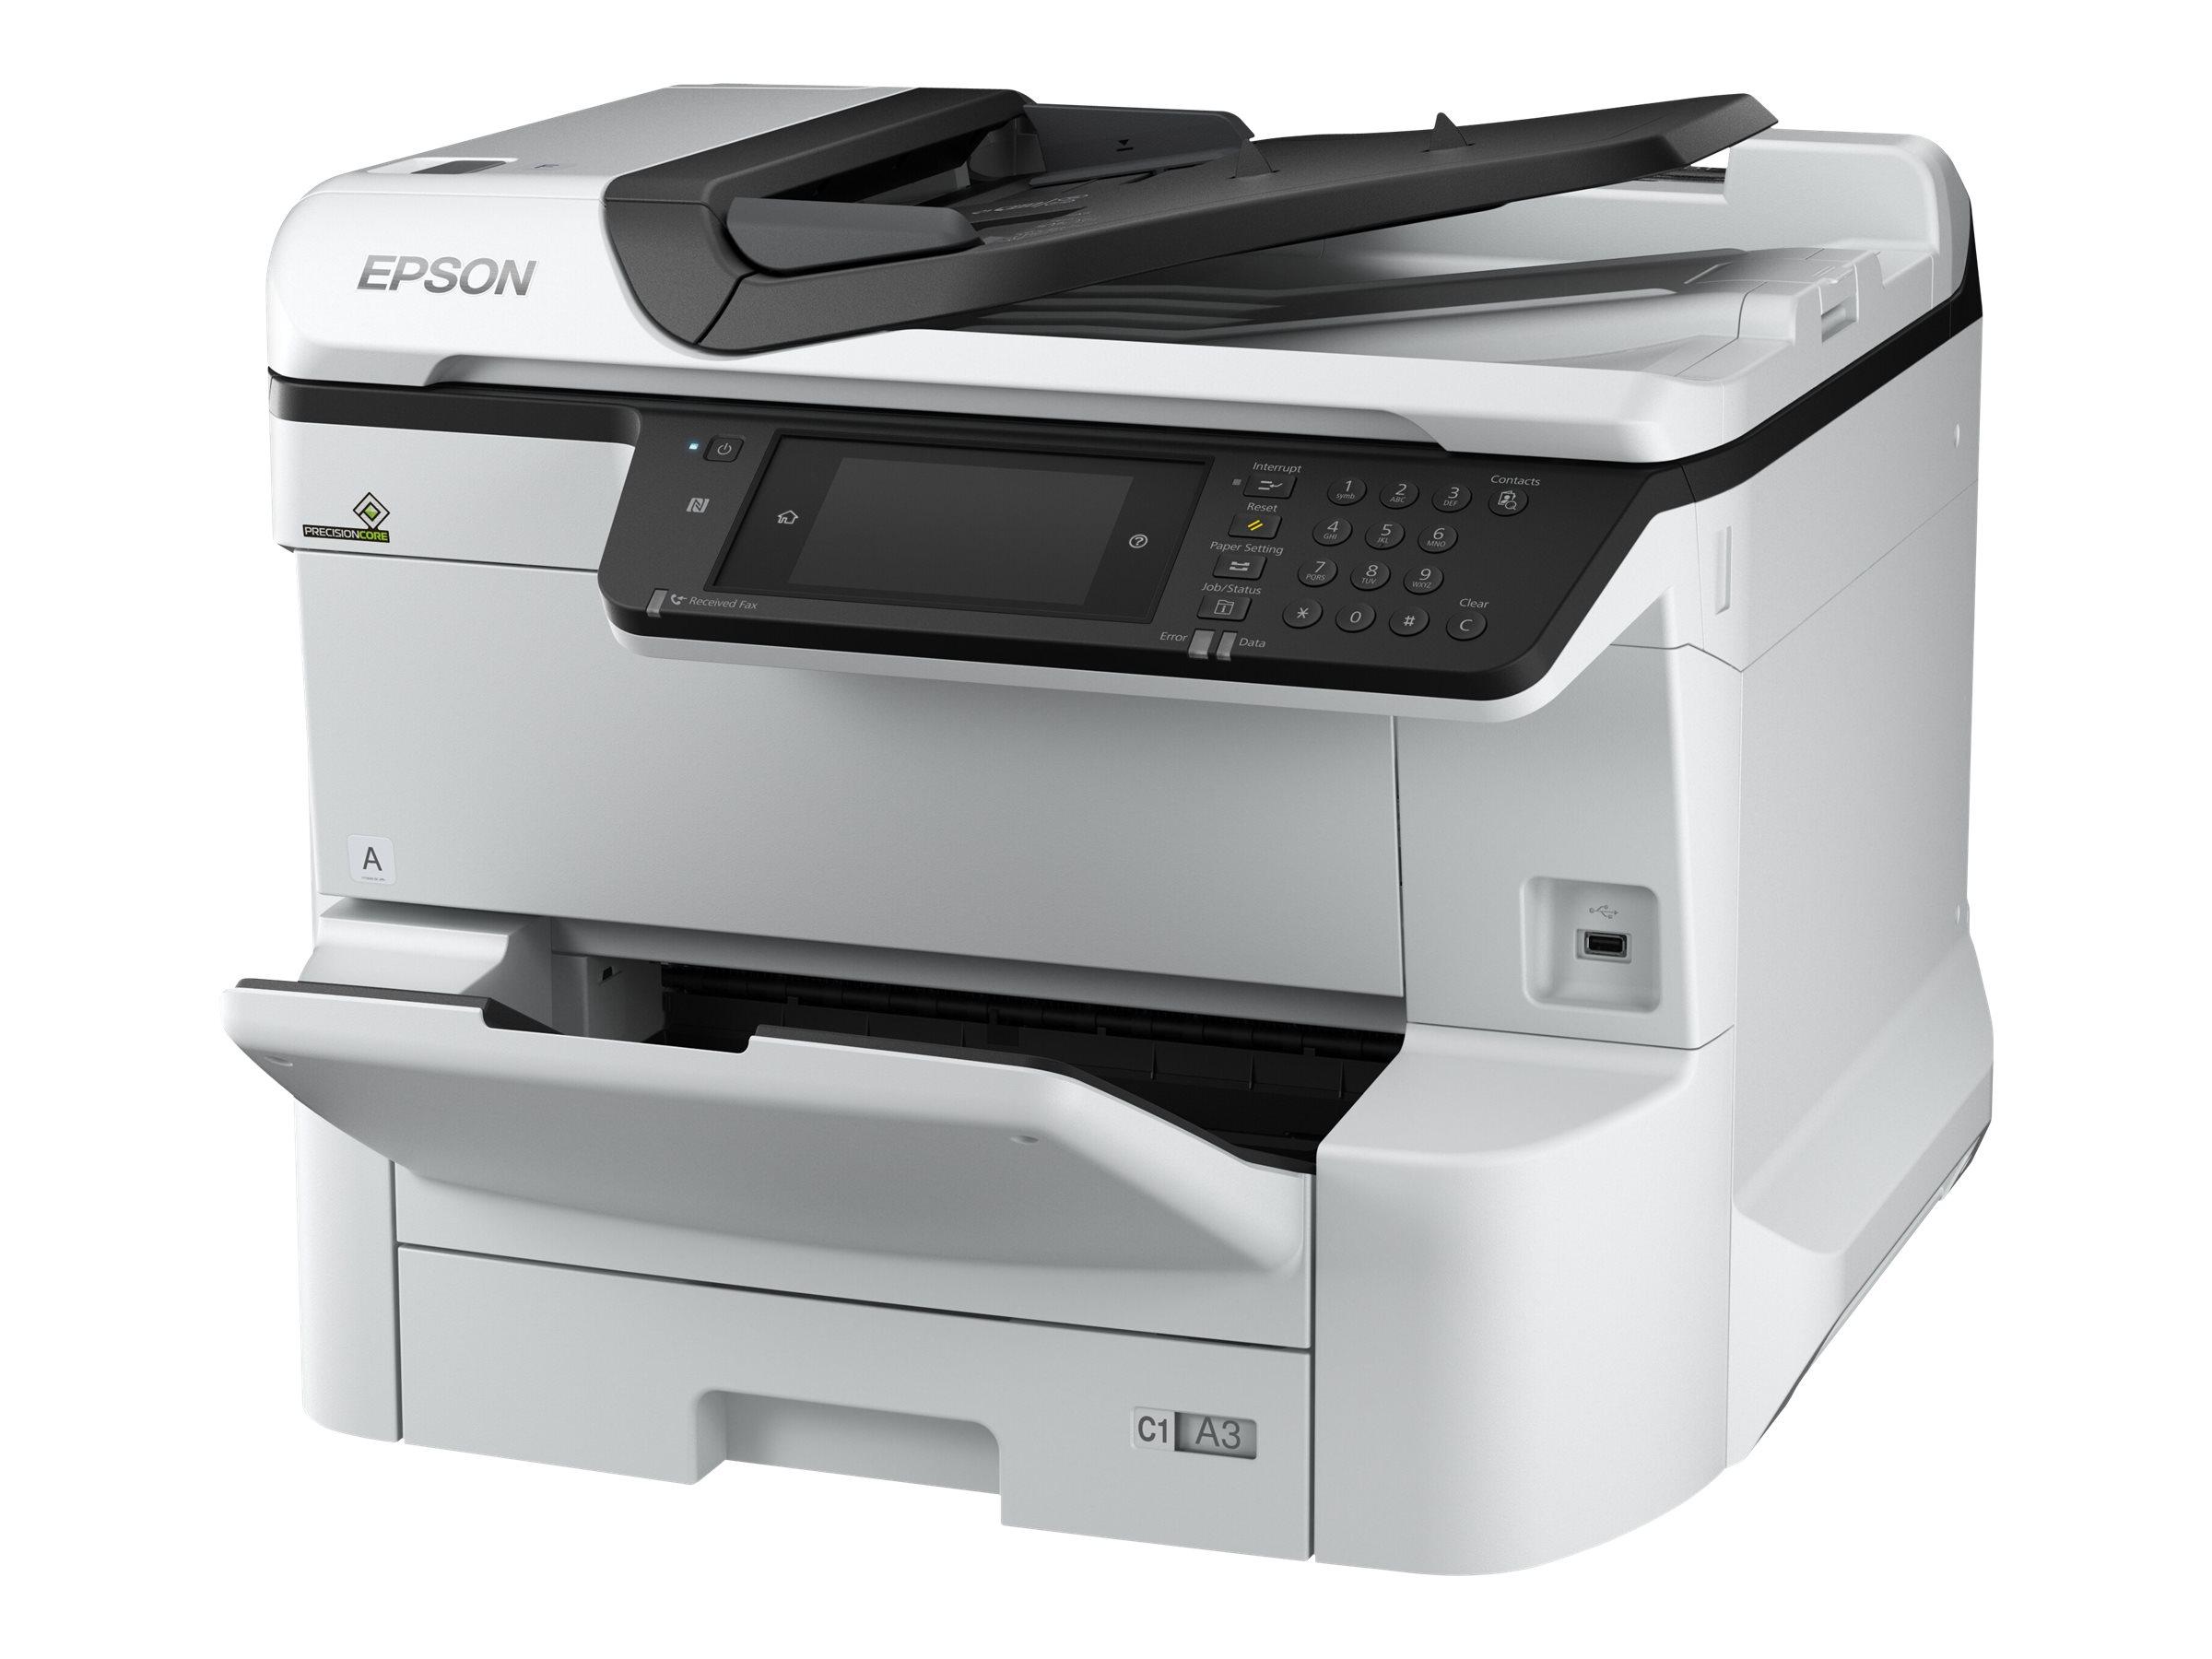 Epson WorkForce Pro WF-C8610DWF - Multifunktionsdrucker - Farbe - Tintenstrahl - A3 (297 x 420 mm) (Original) - A3 (Medien)